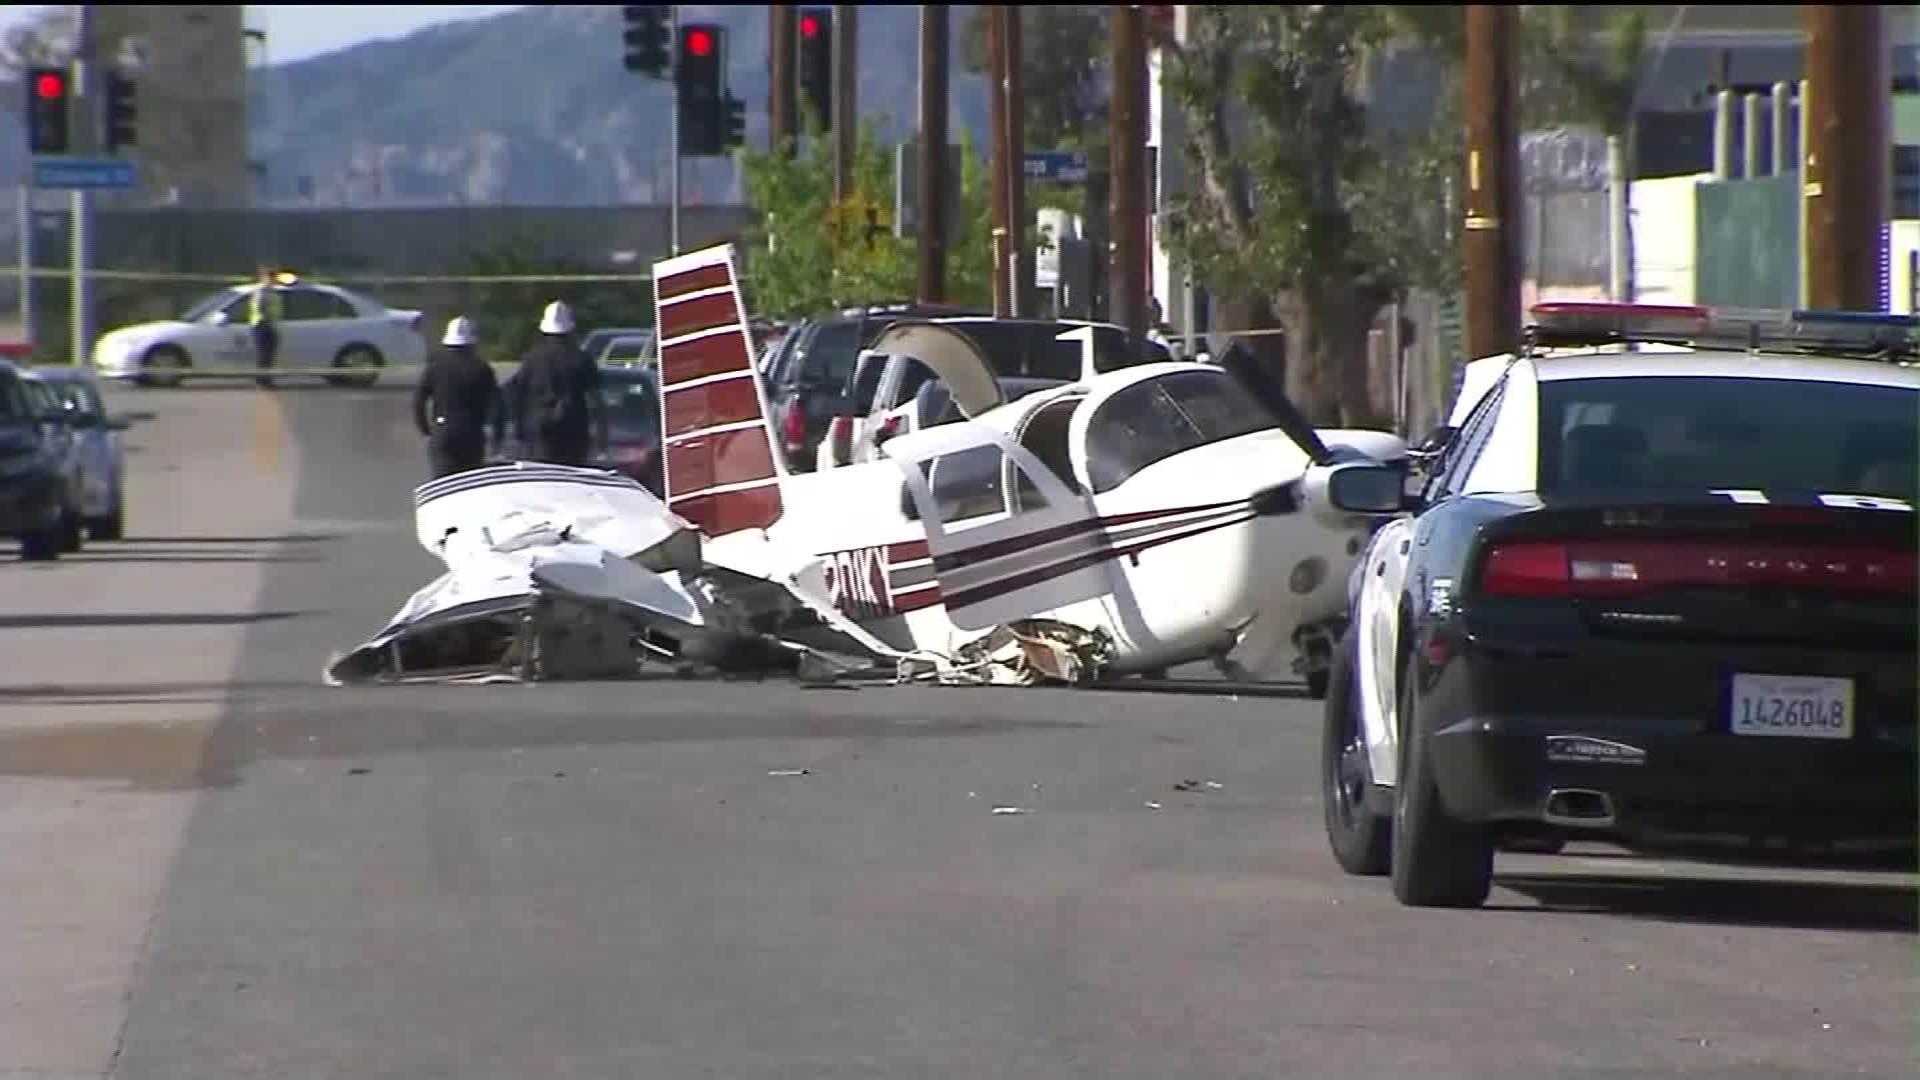 Plane Crashes Into Car Kills Woman Cnn Video